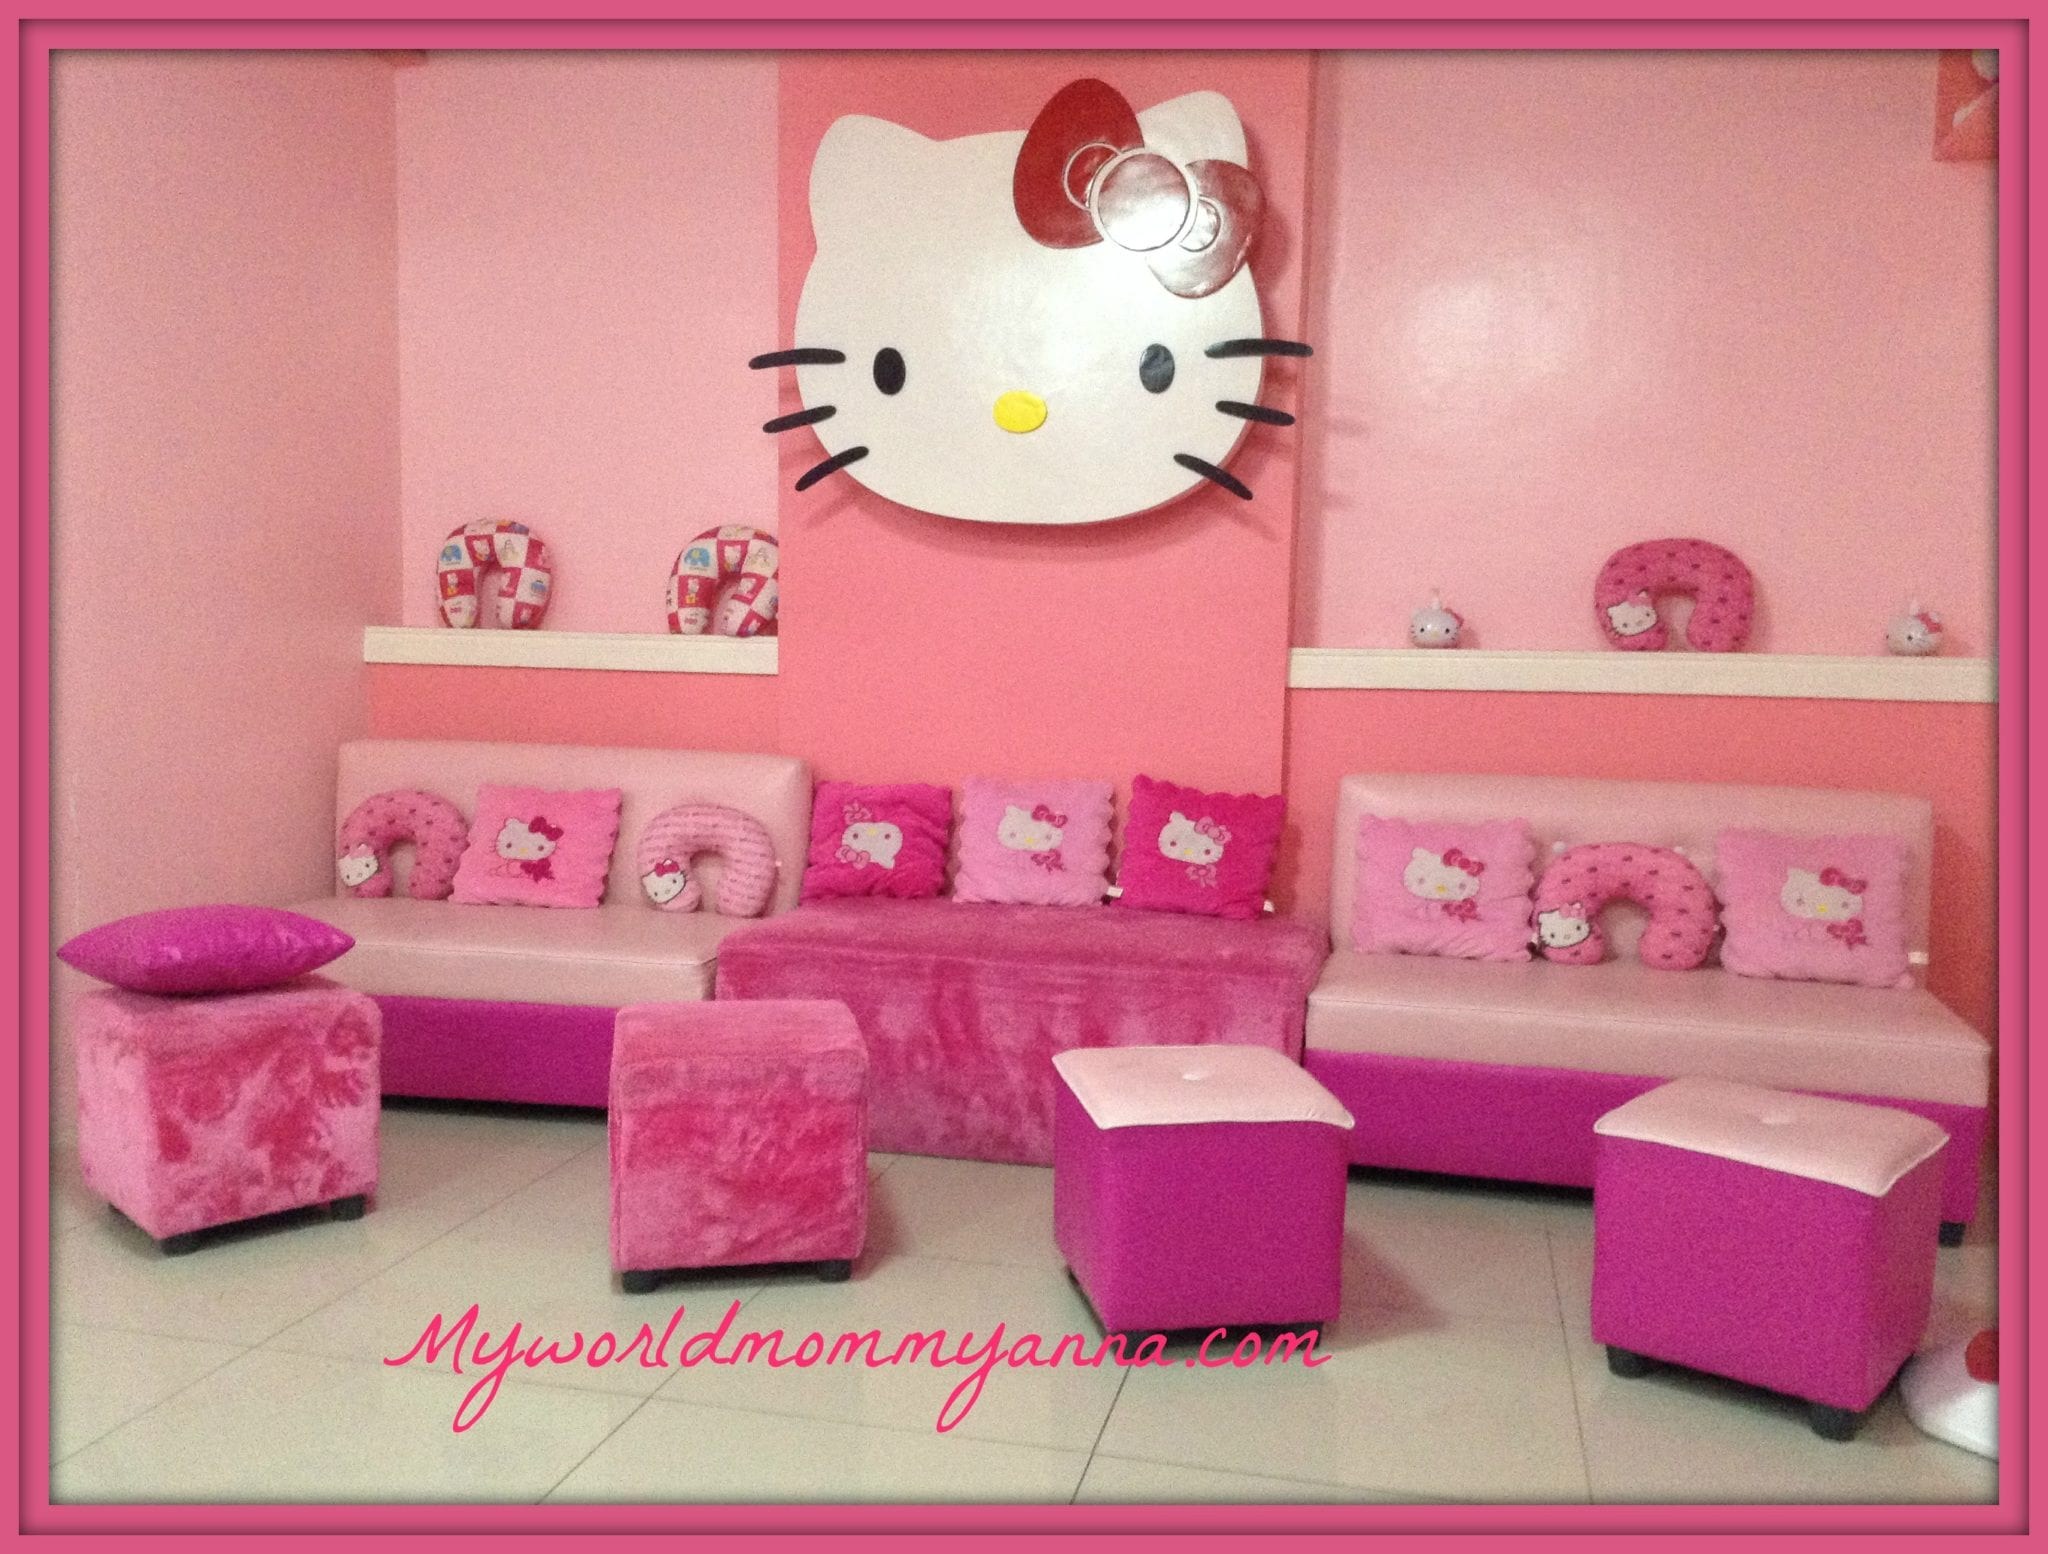 girl bonding momsie kitty spa and slimming salon my world mommy anna